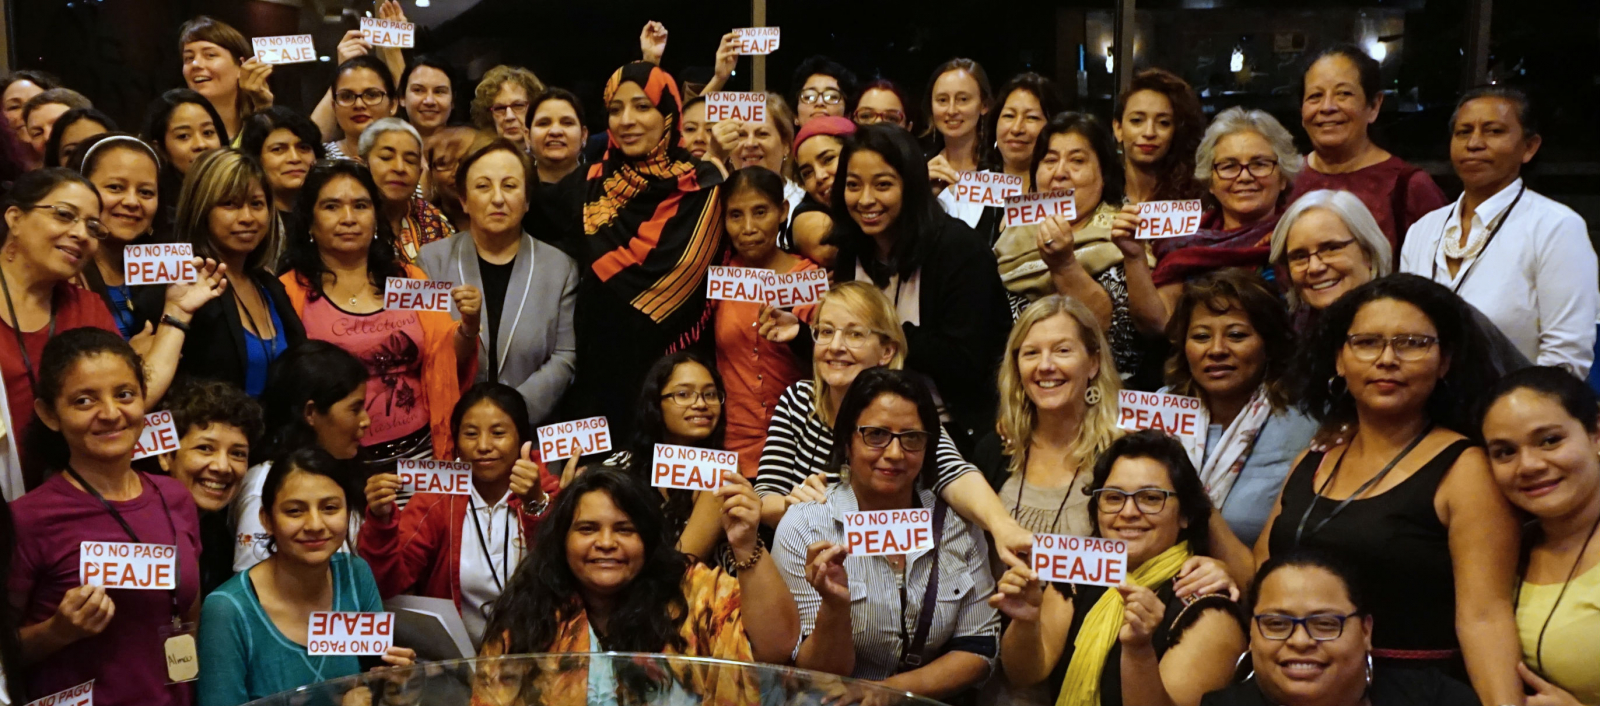 Women Land Peace, Nobel Women's Initiative, Tawakkol Karmen, Honduras, Tegucigalpa, Berta Cáceres